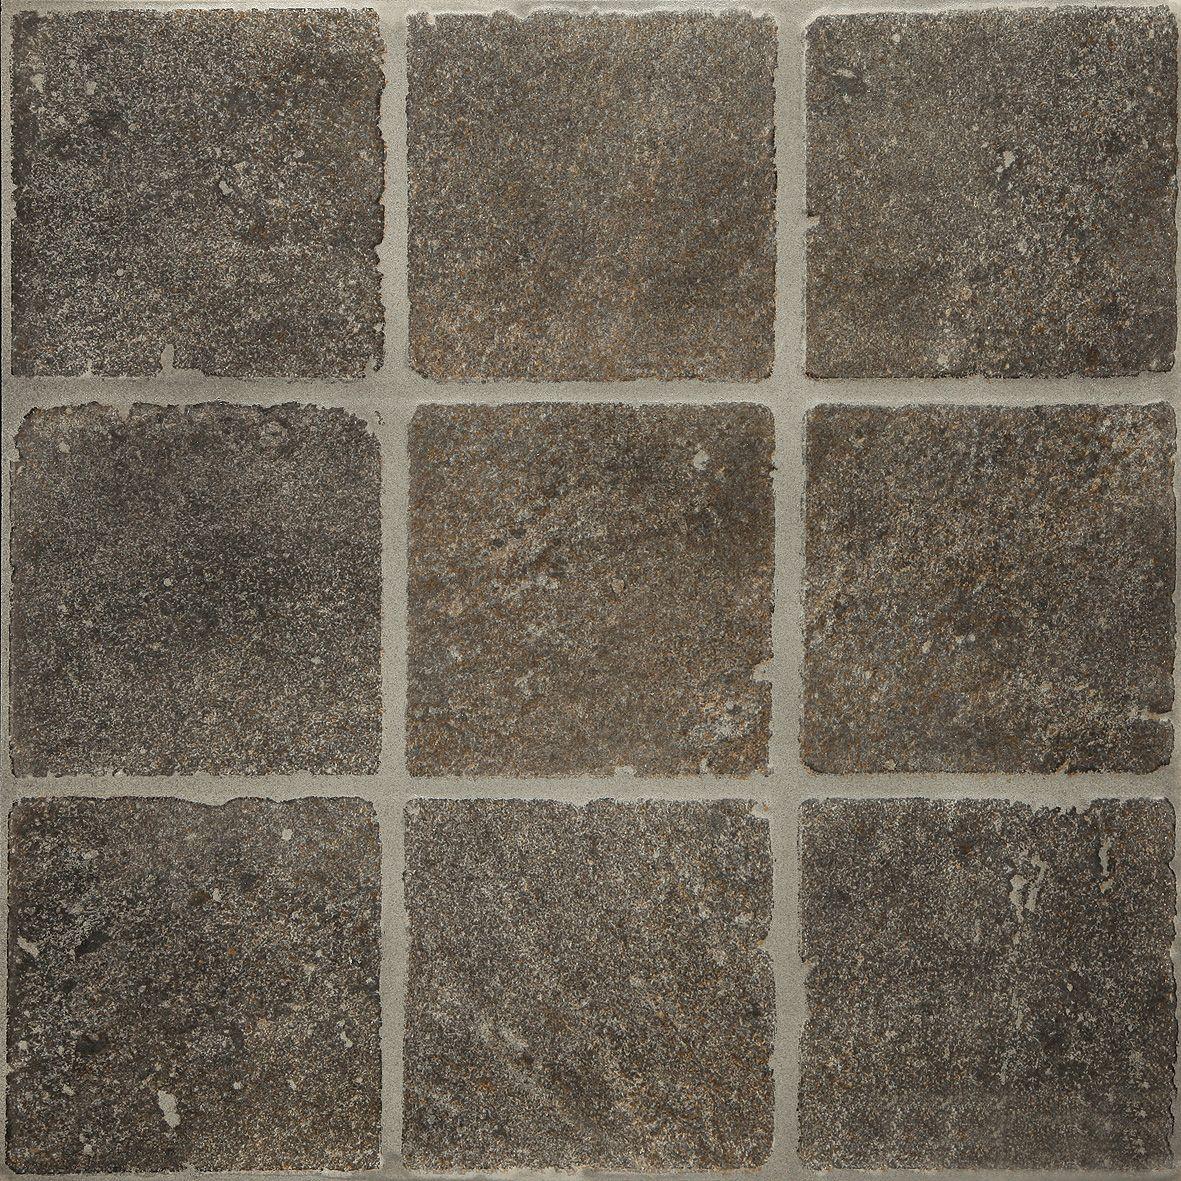 Piso bano piedra 45x45 casa interiores pisos for Pisos de ceramica para exteriores